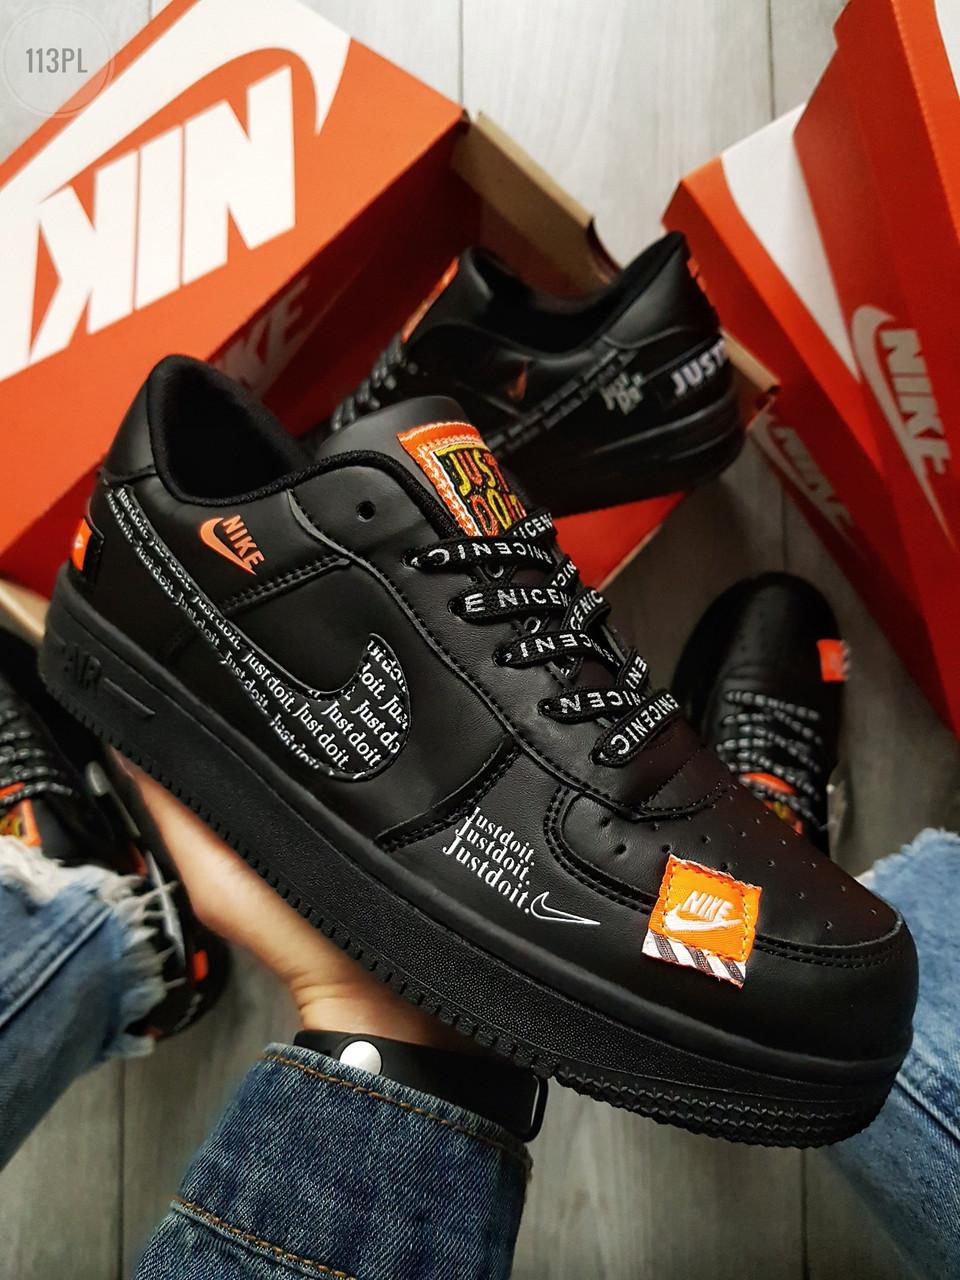 Мужские кроссовки Nike Air Force Just Do It Low Black (р. 40)